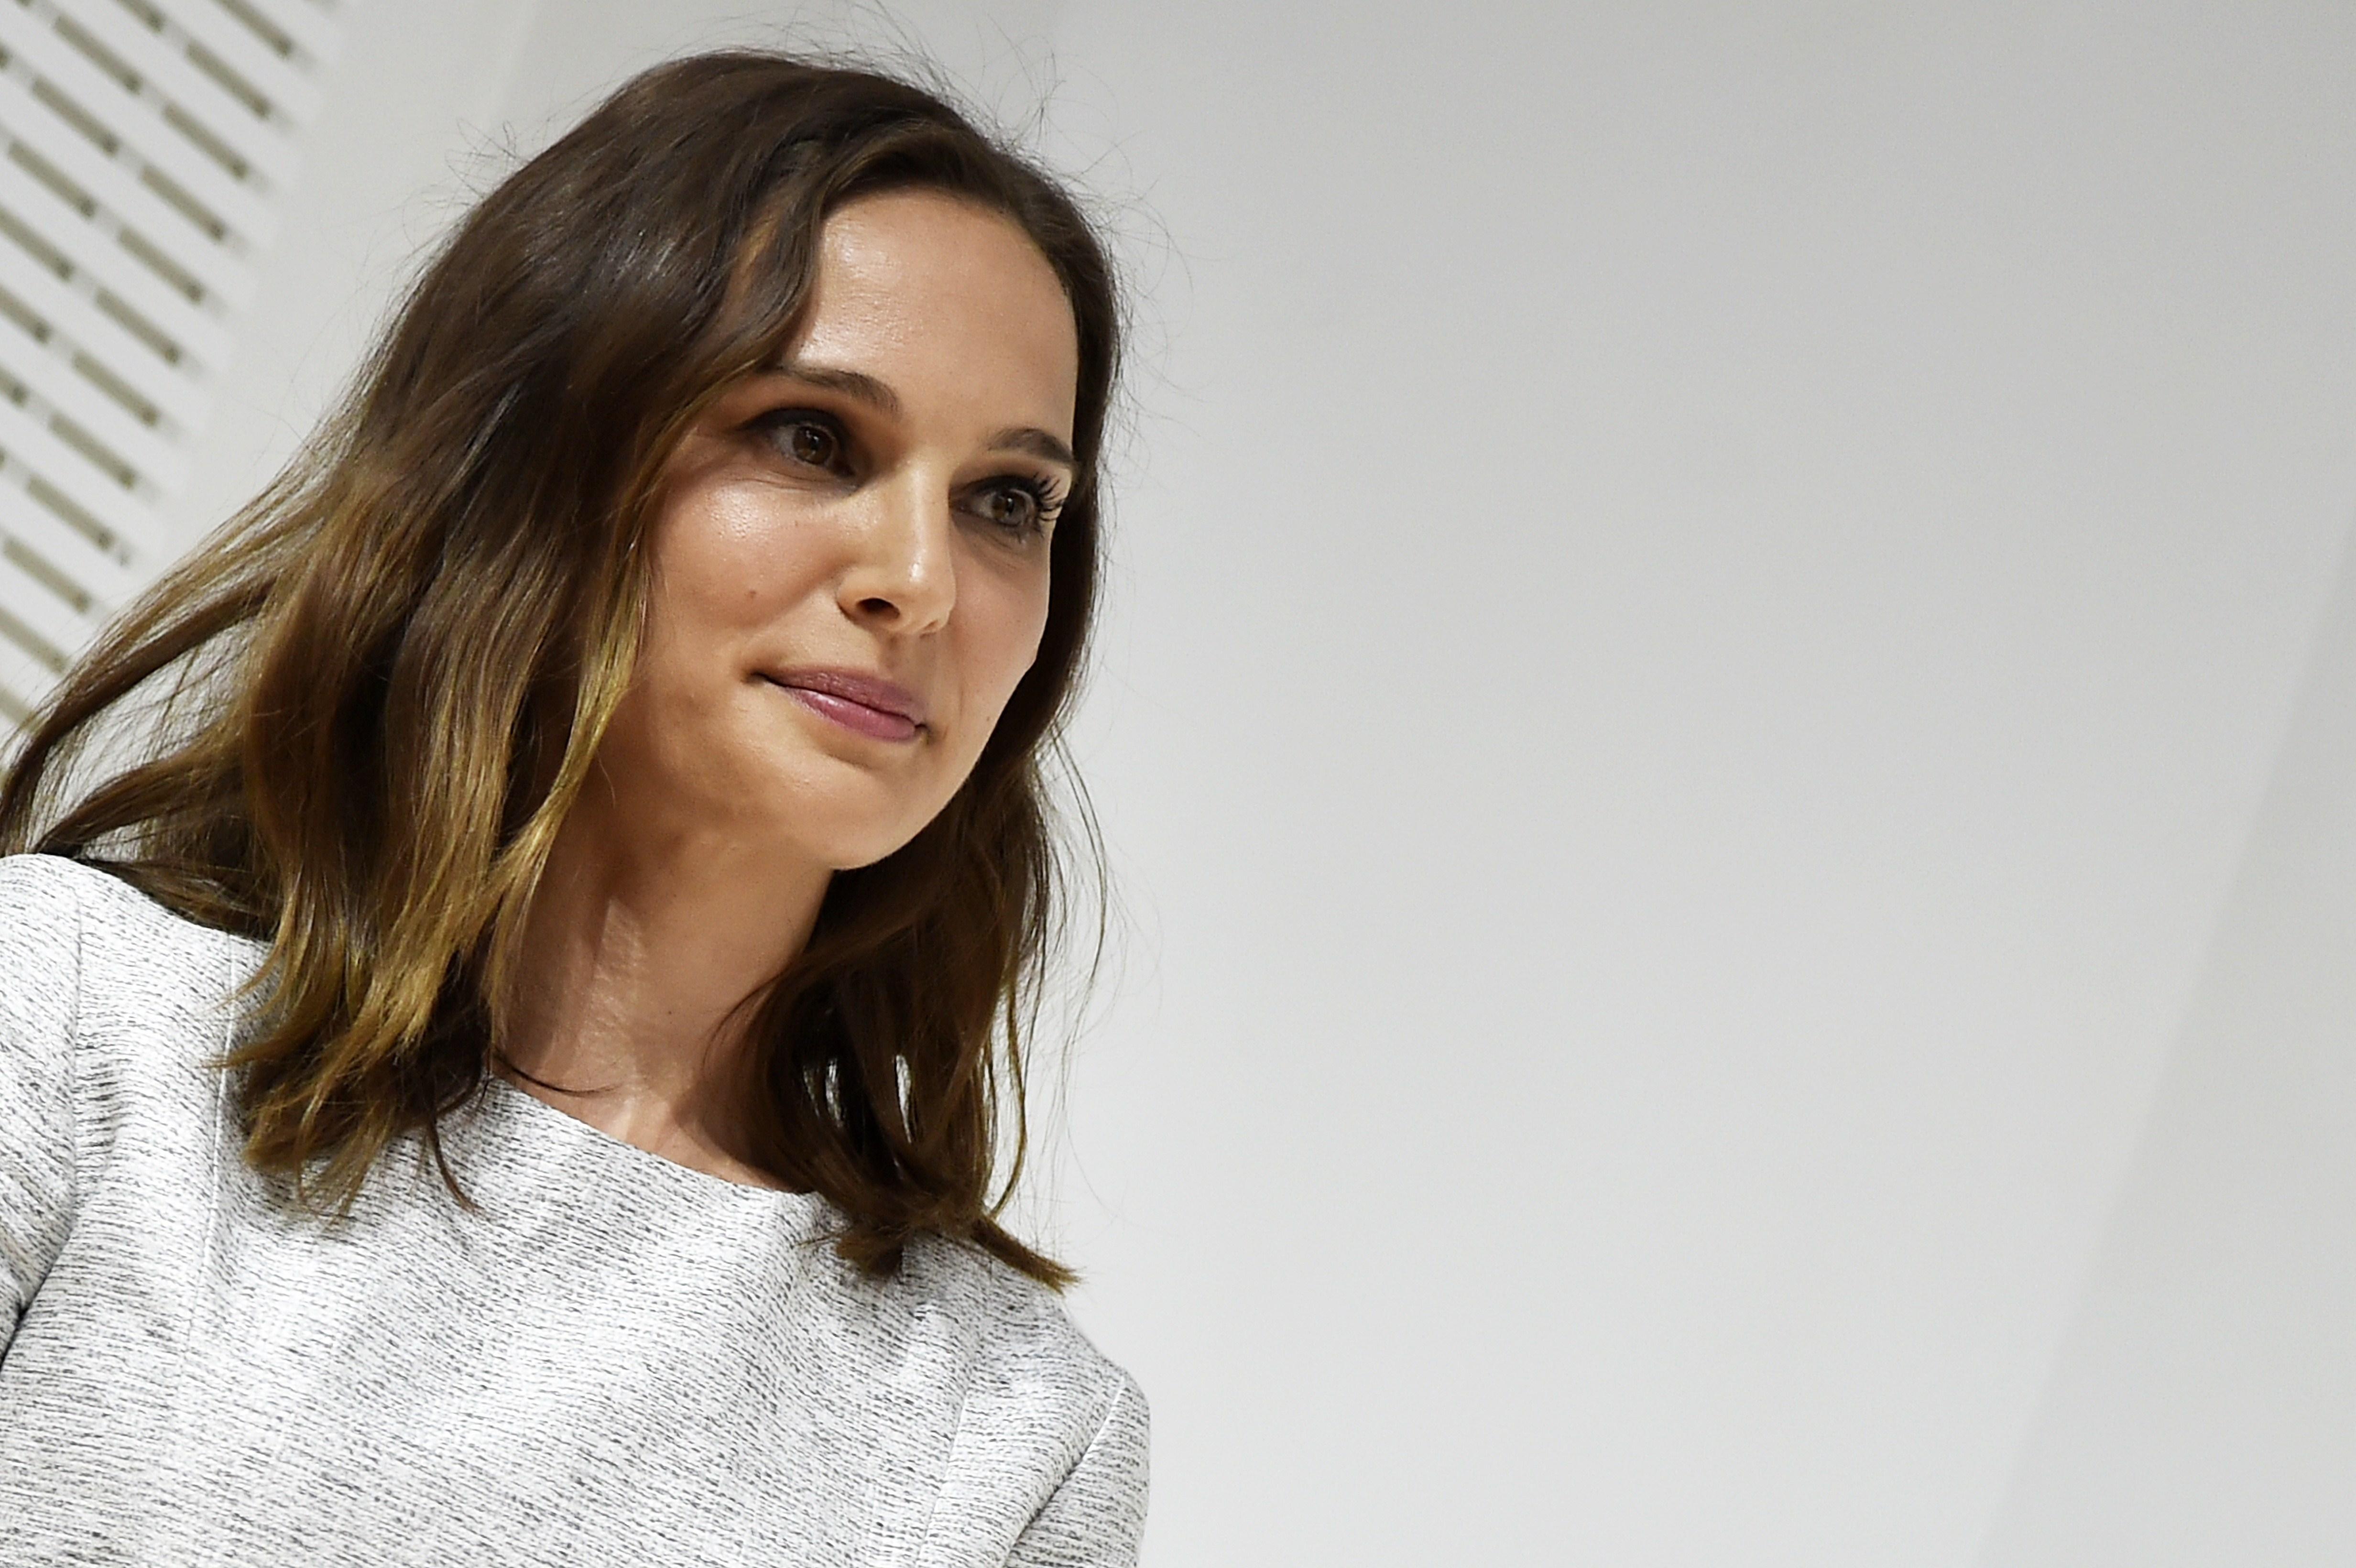 Natalie Portman Instagram